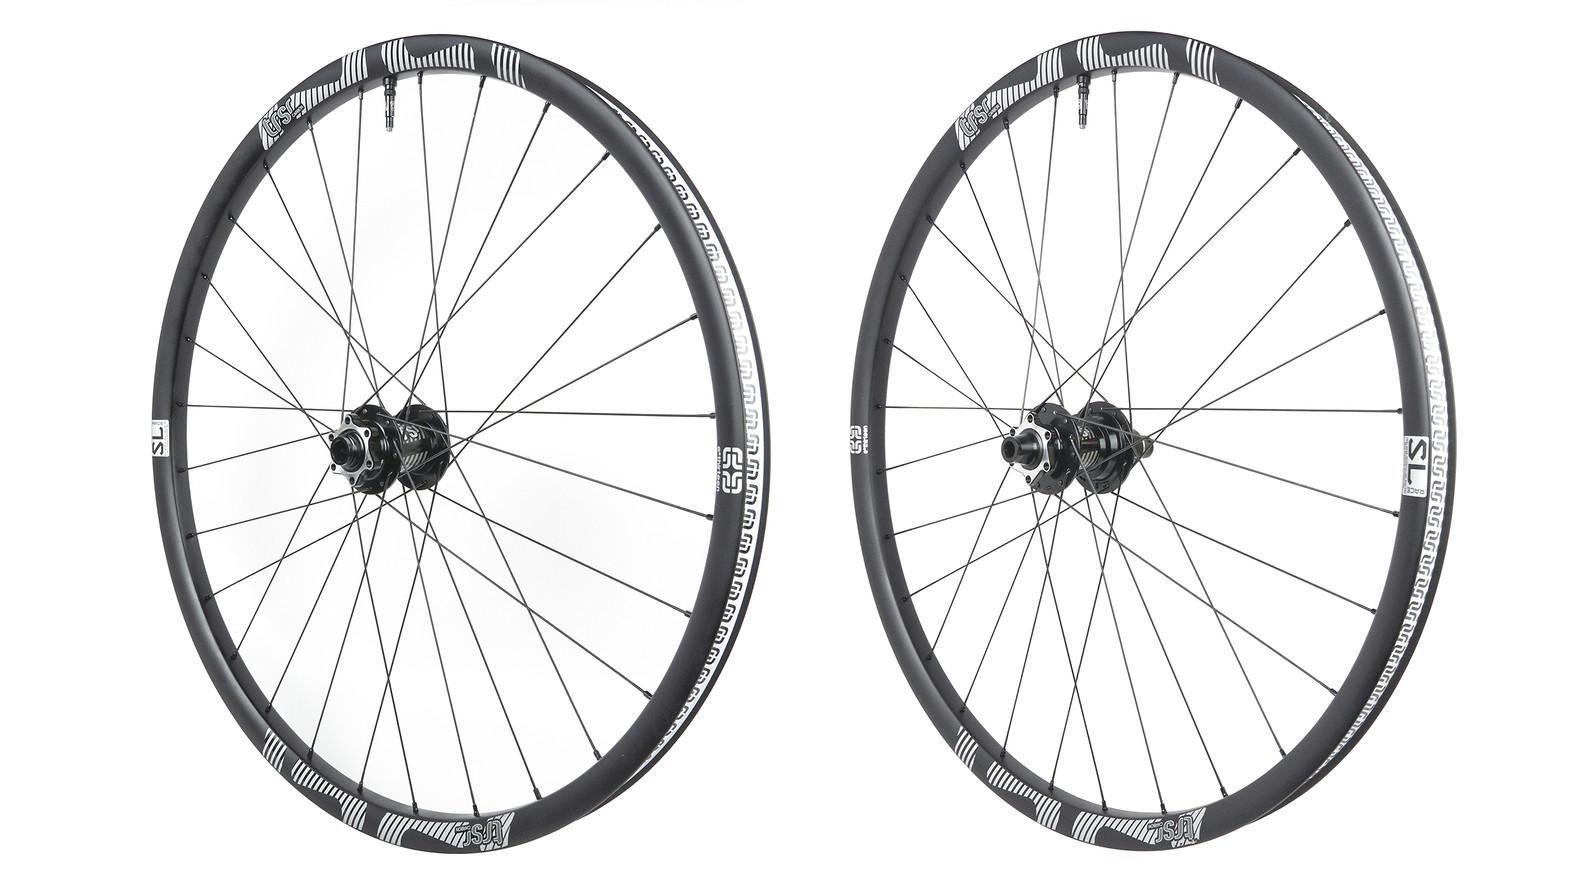 e*thirteen TRSr SL Wheels